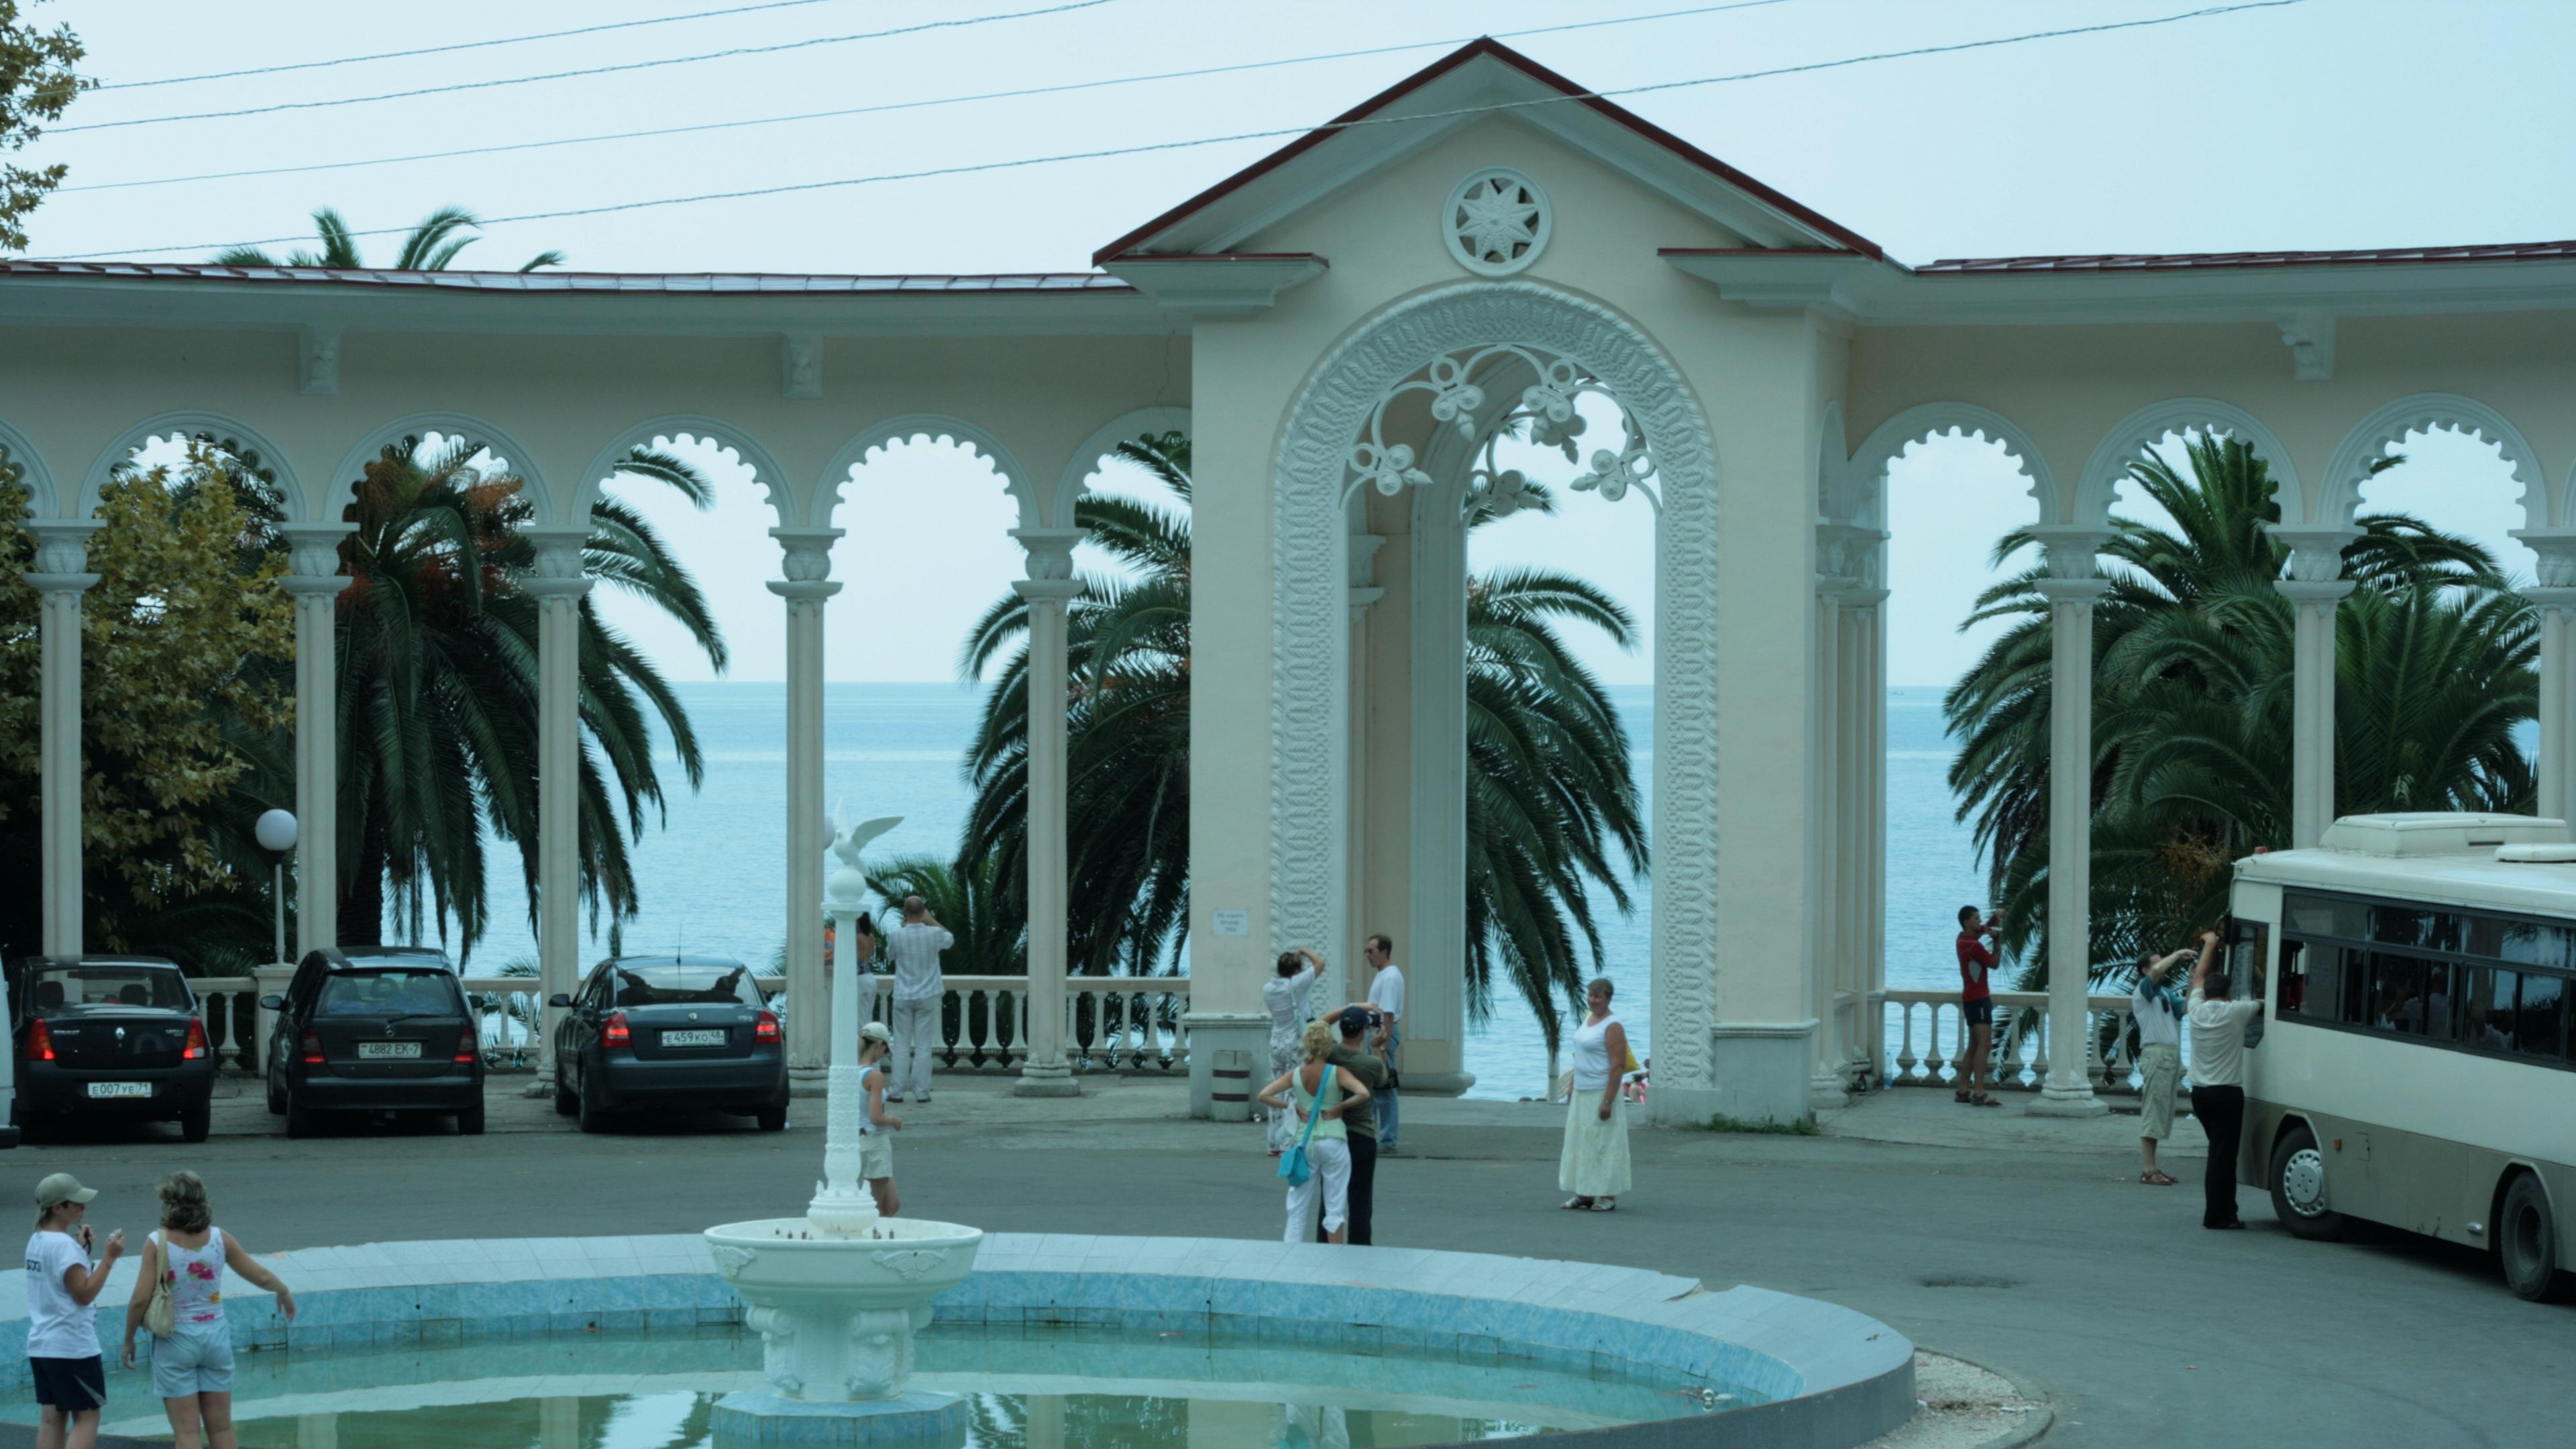 abkhazia gagra promenade arch sights 4k 1538066288 - abkhazia, gagra, promenade, arch, sights 4k - promenade, gagra, abkhazia